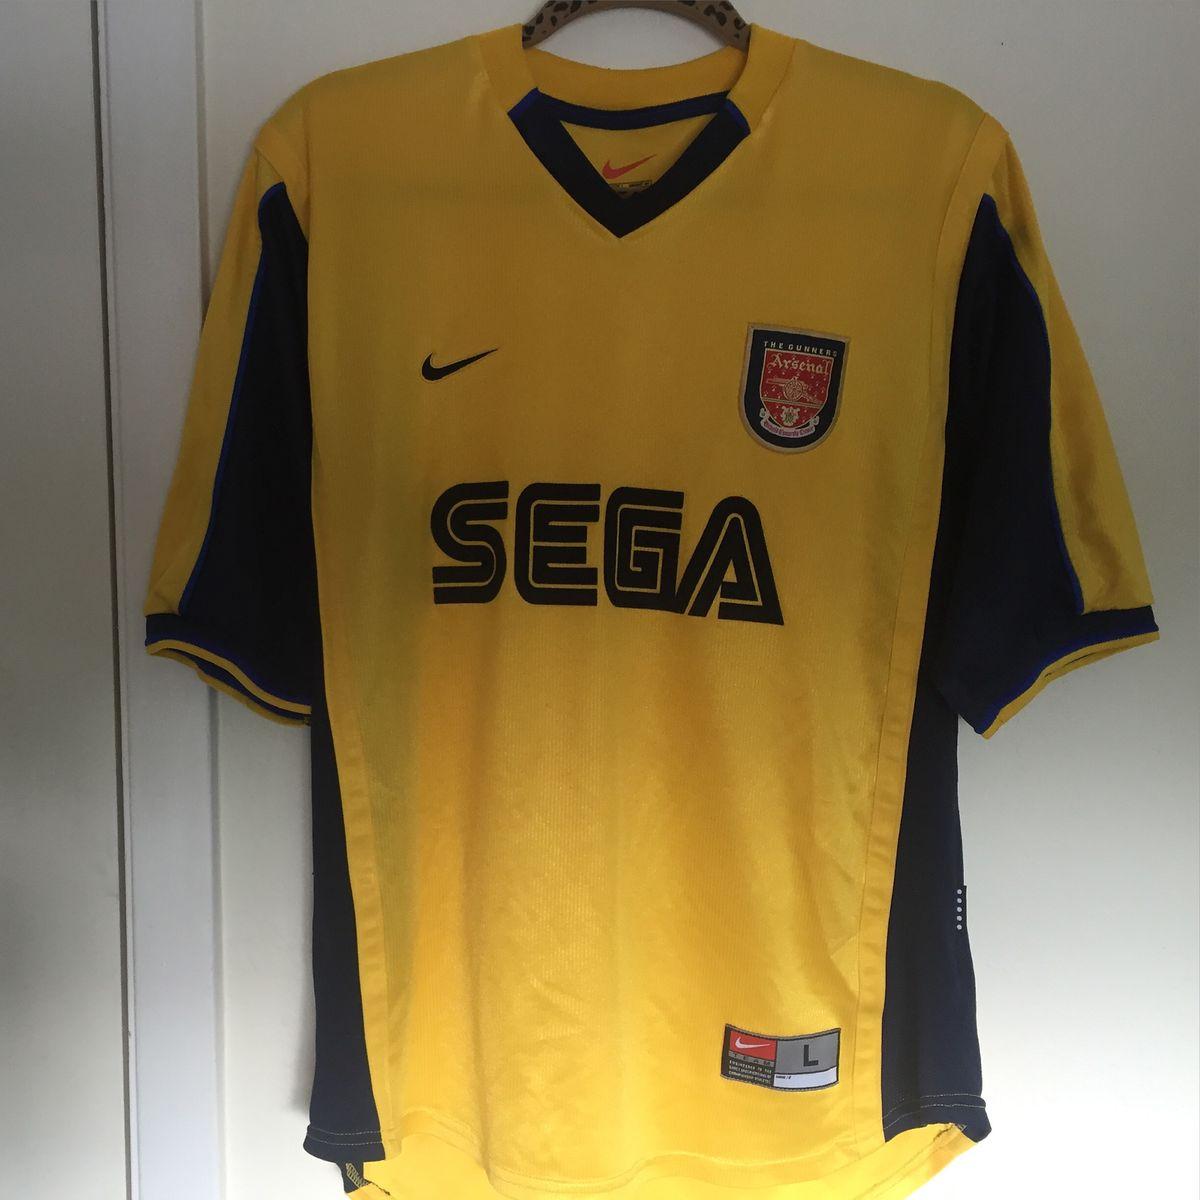 best service 74db1 54616 Vintage 1999 Nike Arsenal Sega Jersey ✨⚽️